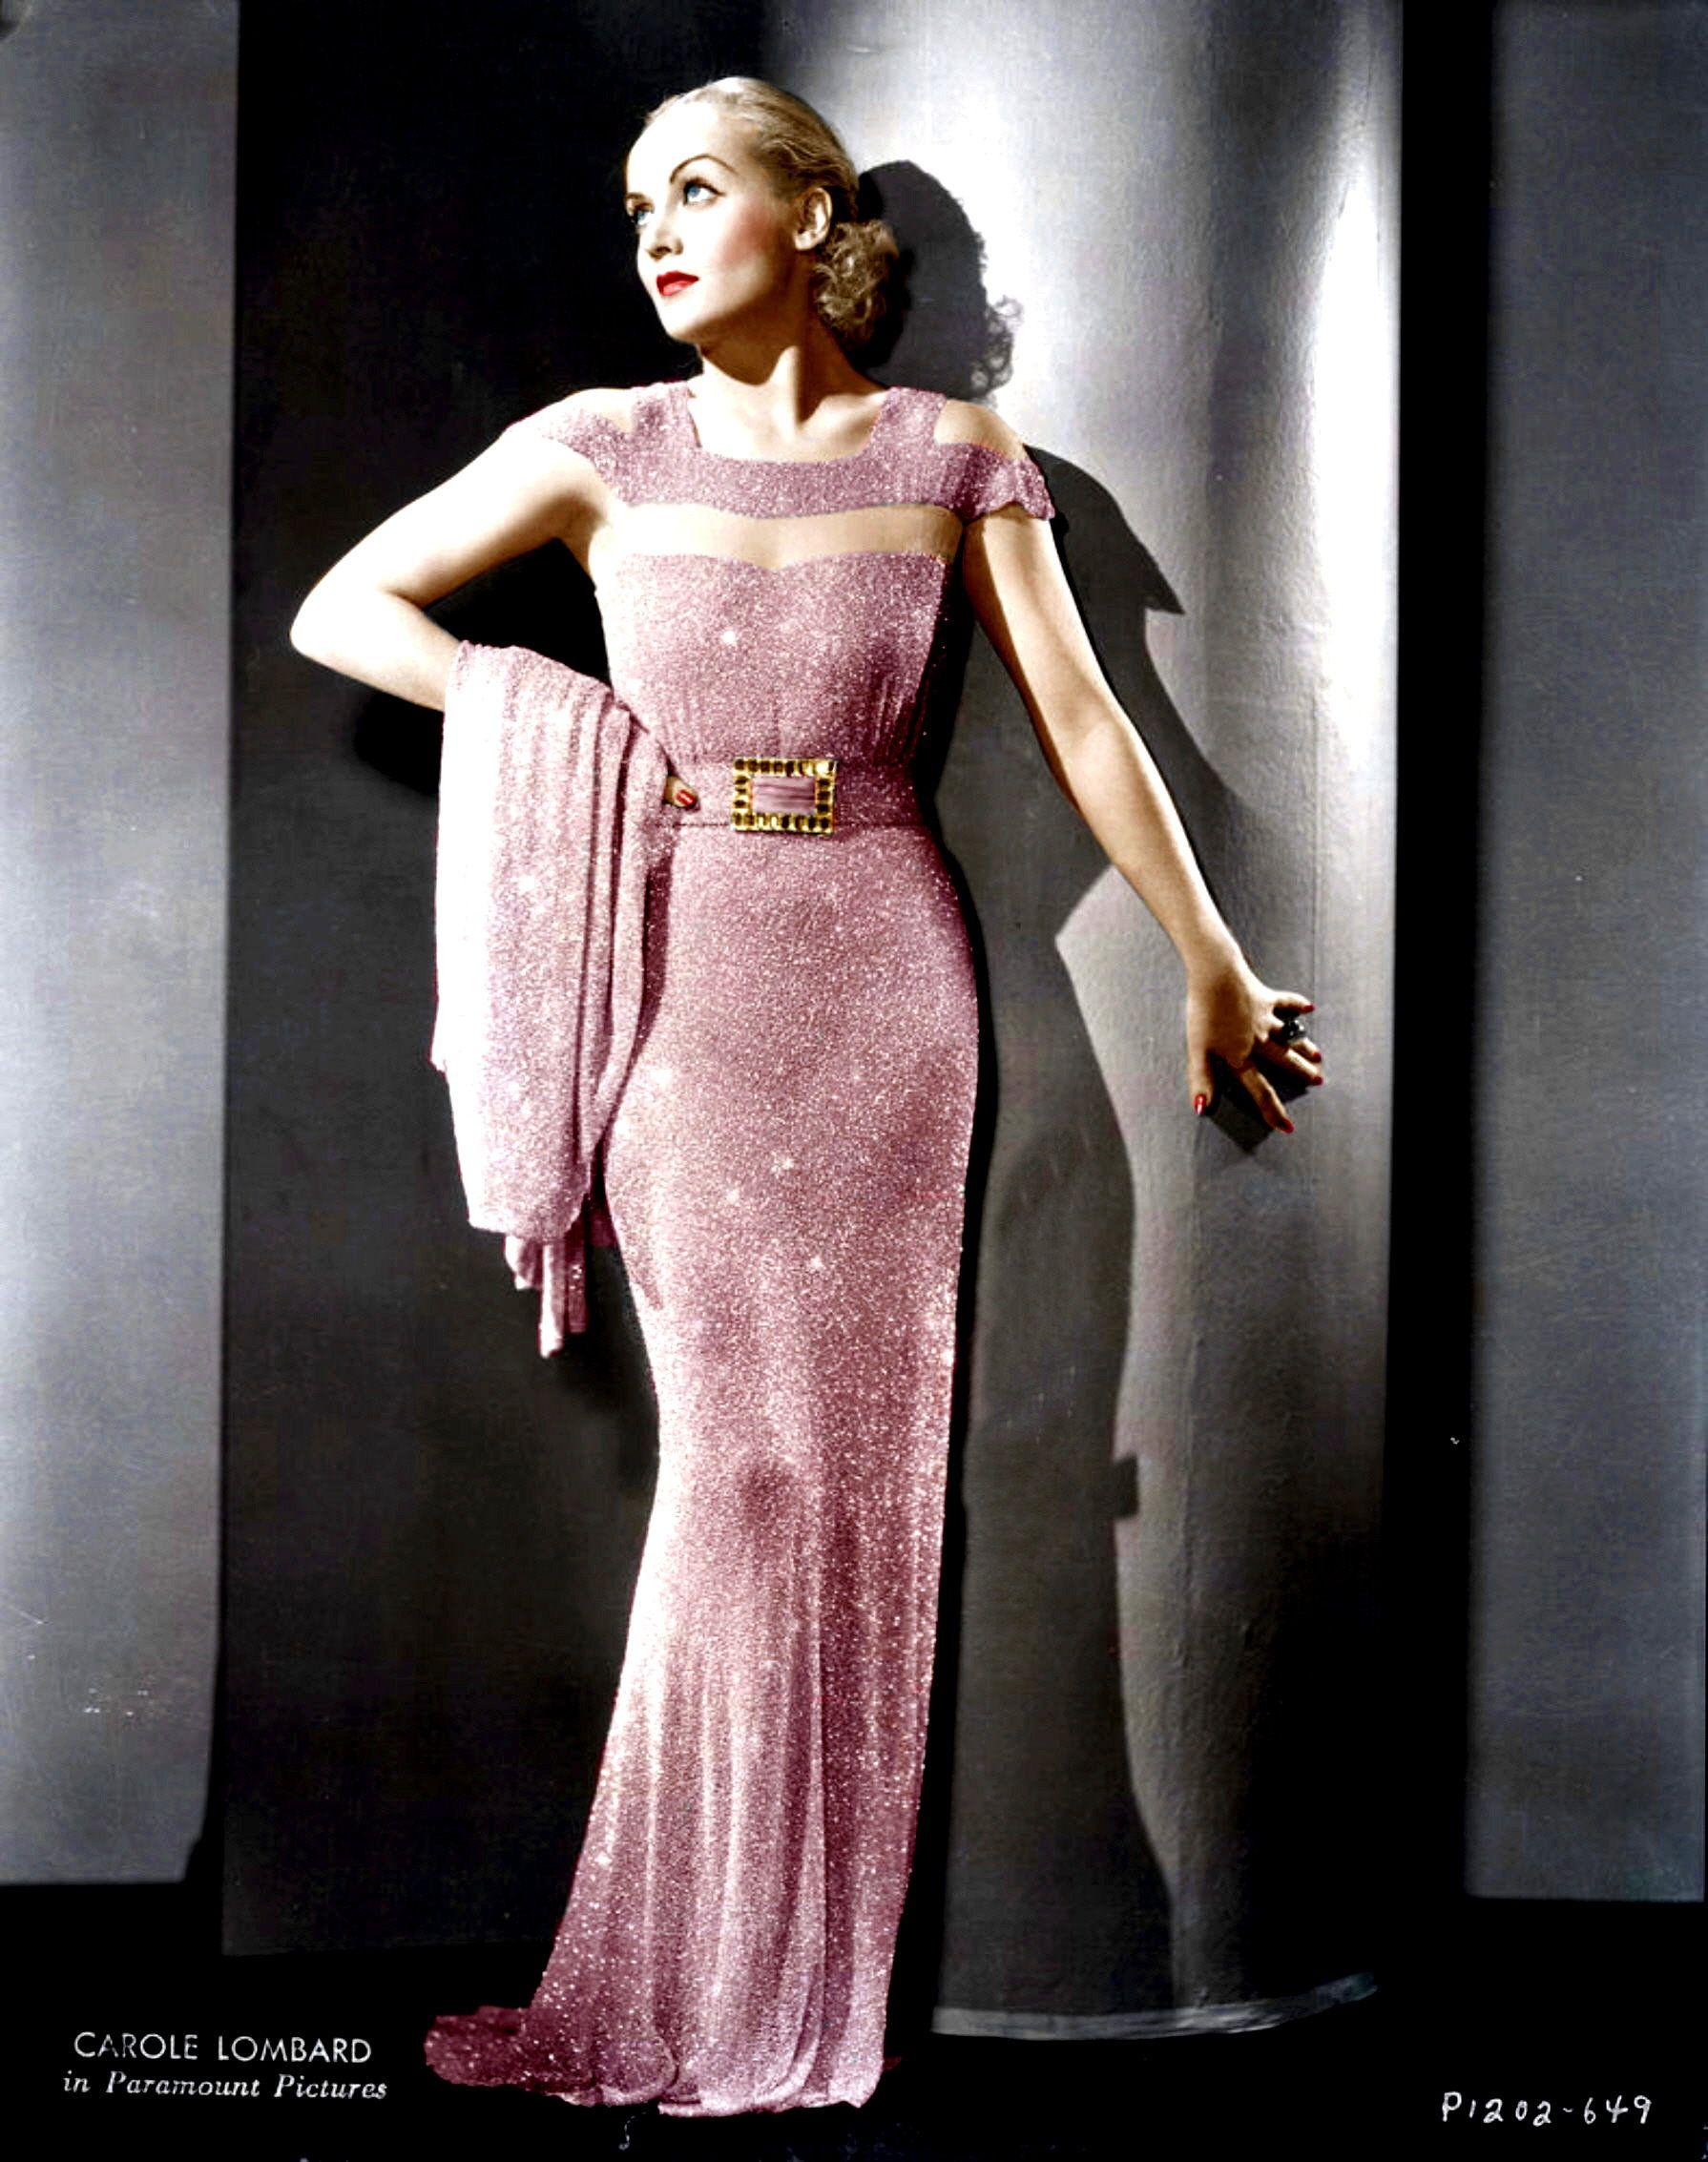 Carole Lombard Hollywood Glamour Dress Hollywood Fashion